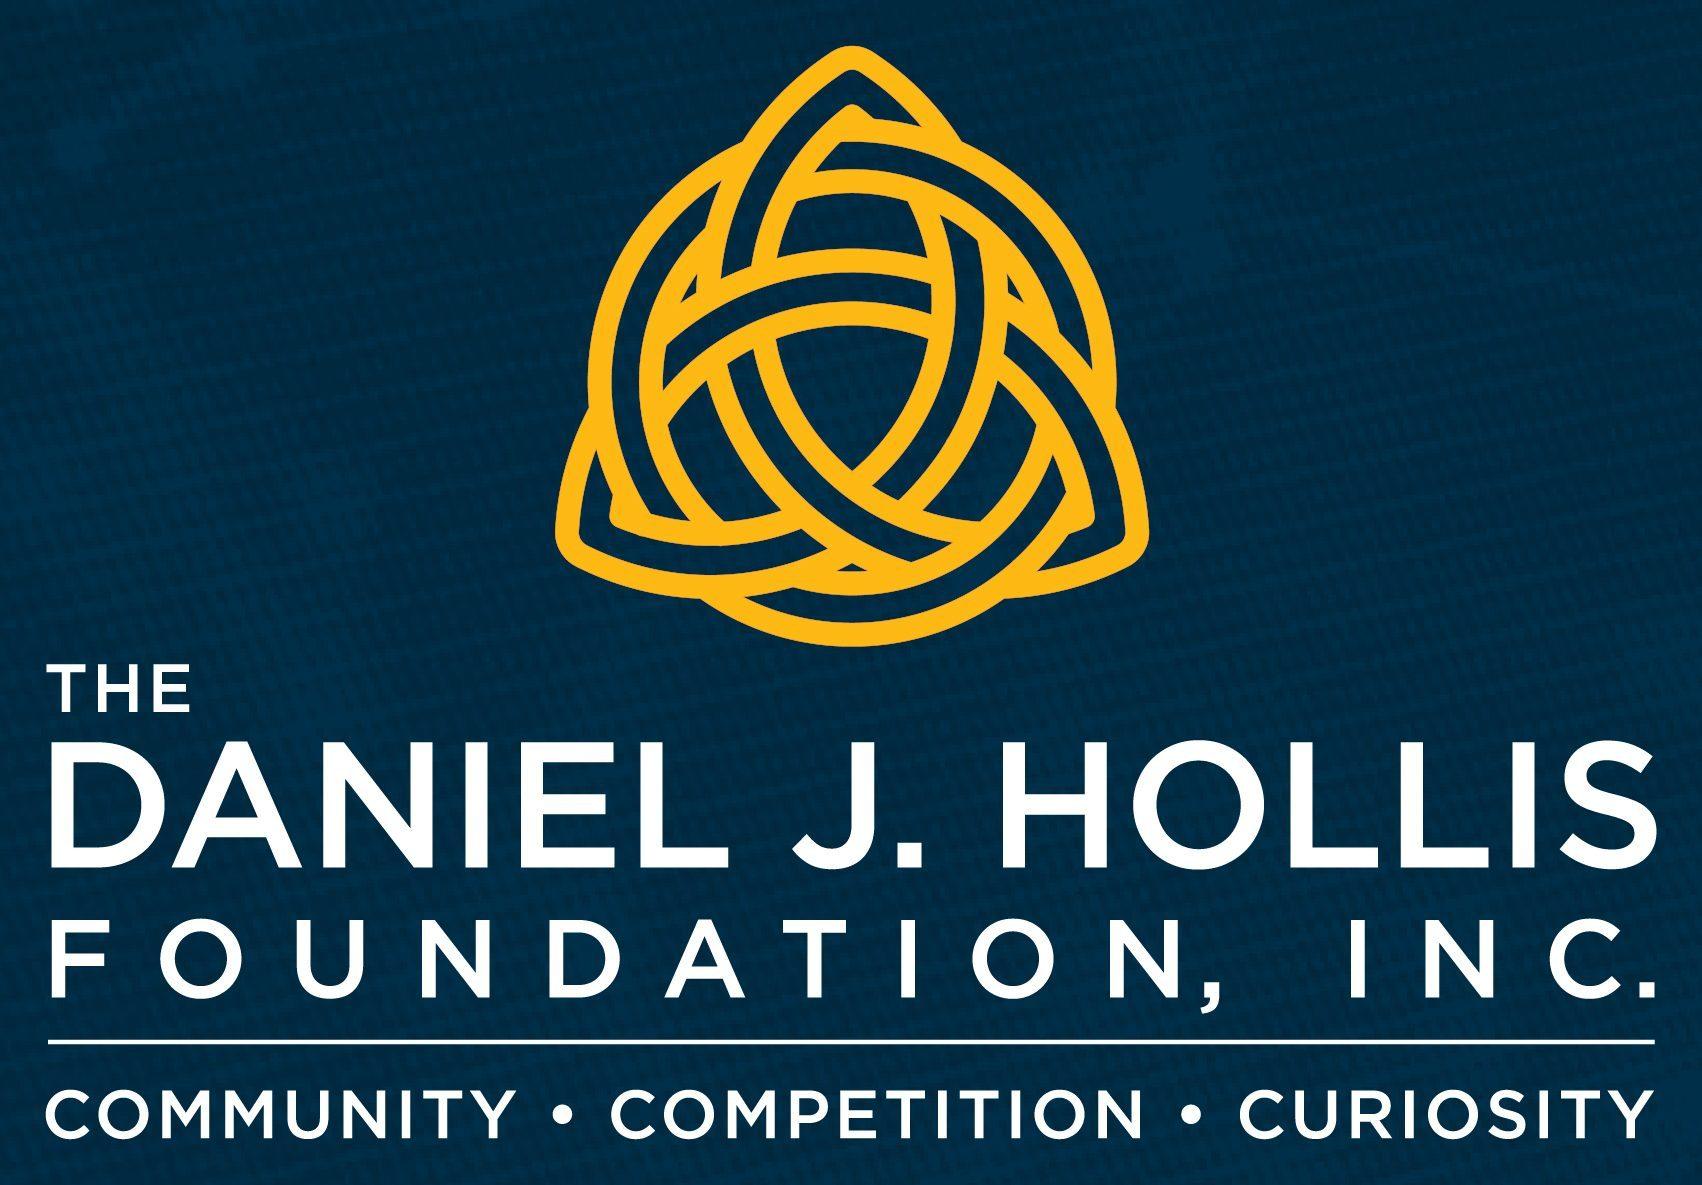 The Daniel J. Hollis Foundation, Inc.